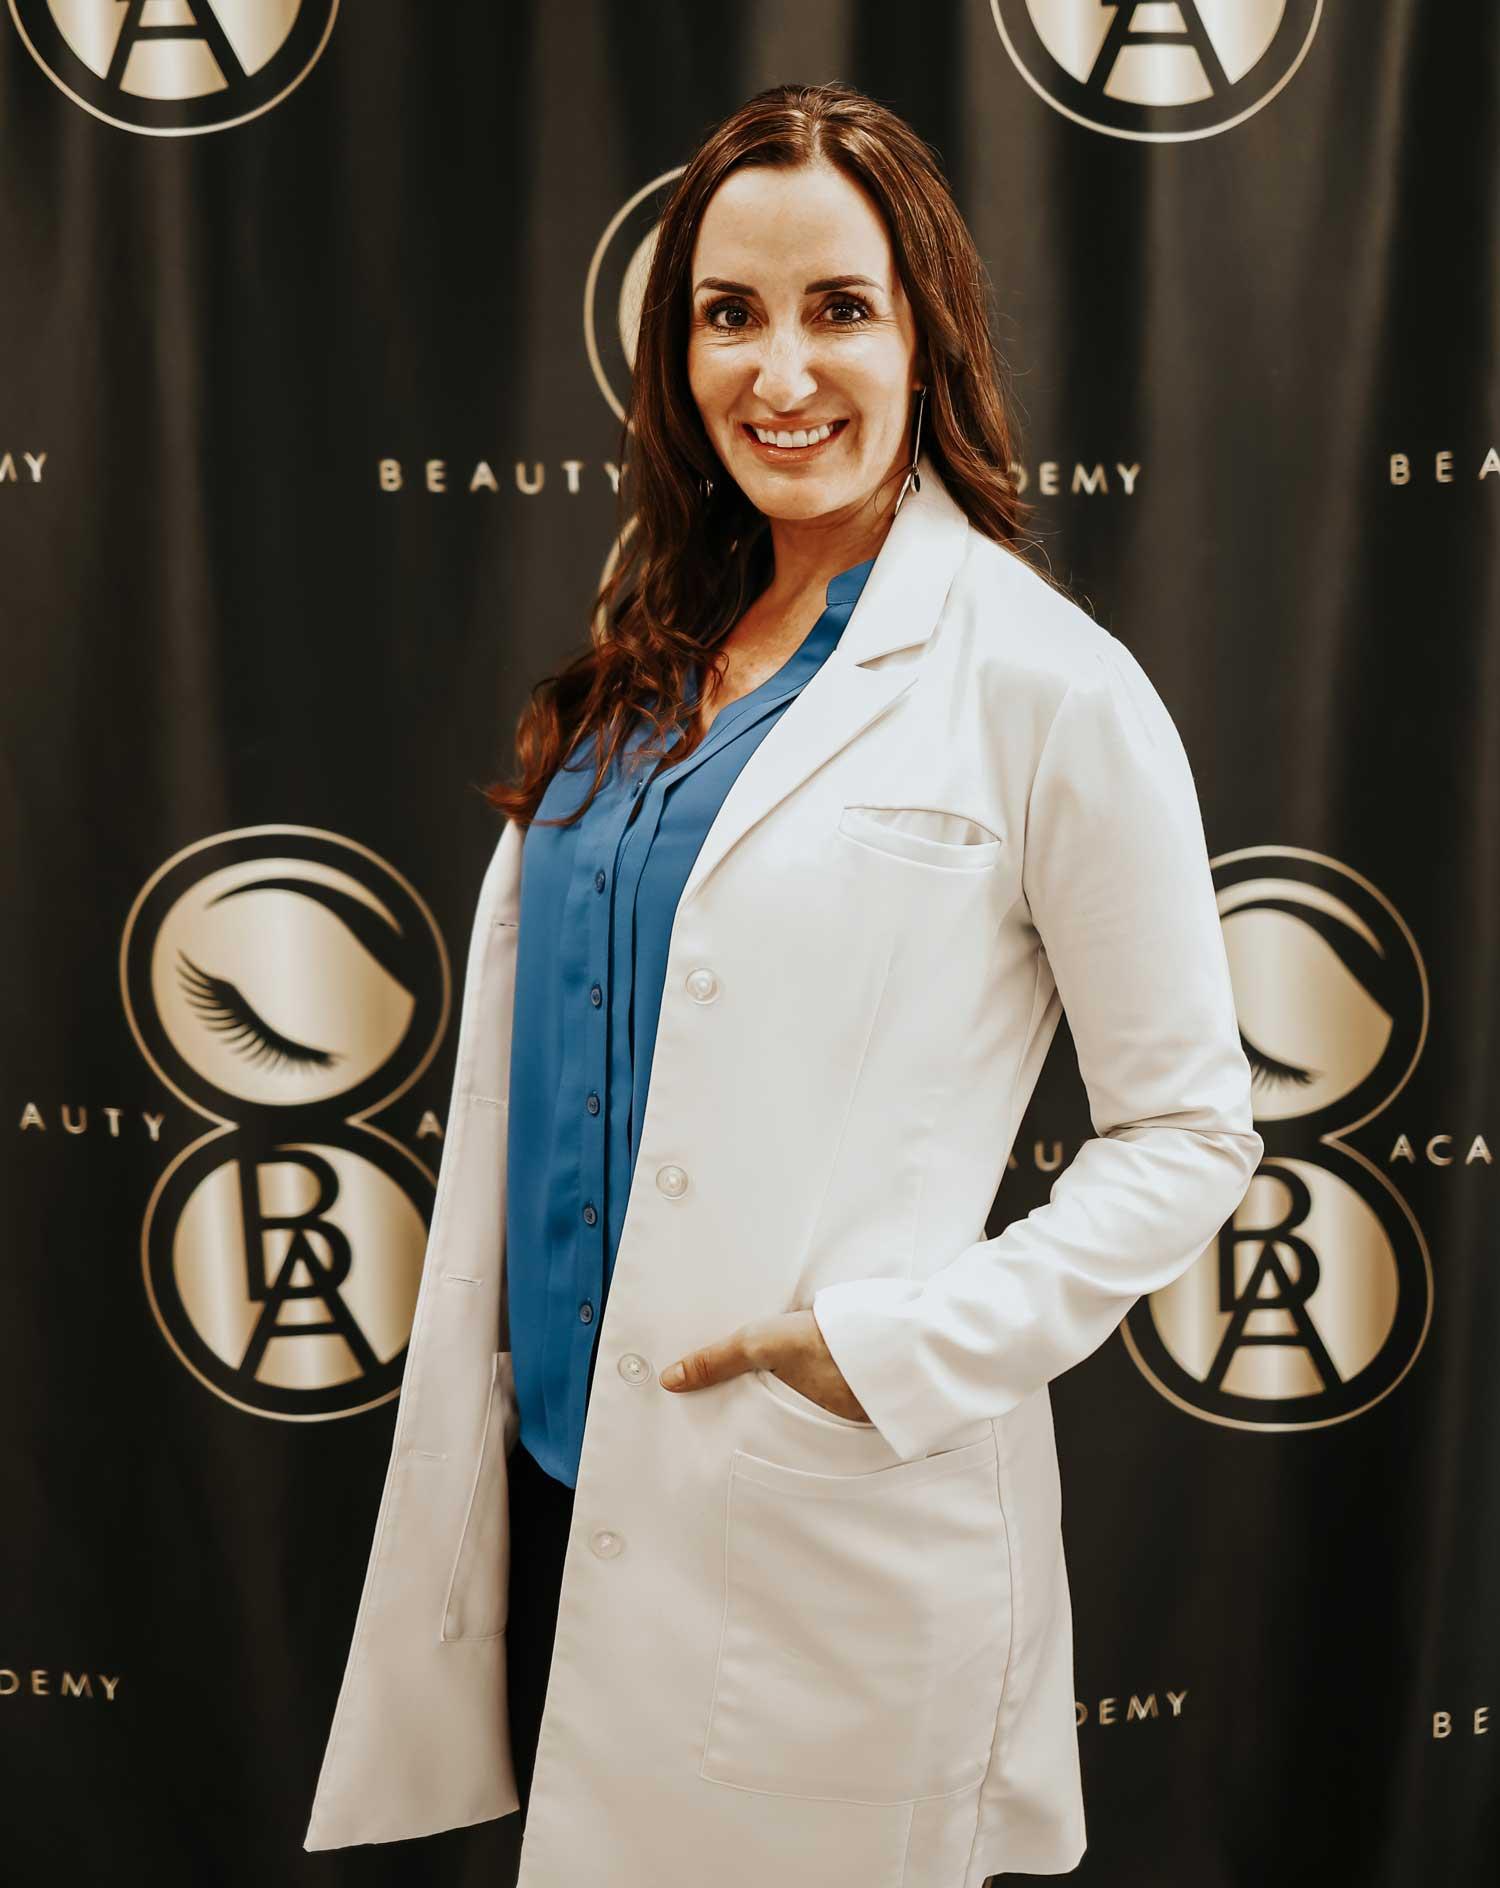 Dr. Amanda Holden